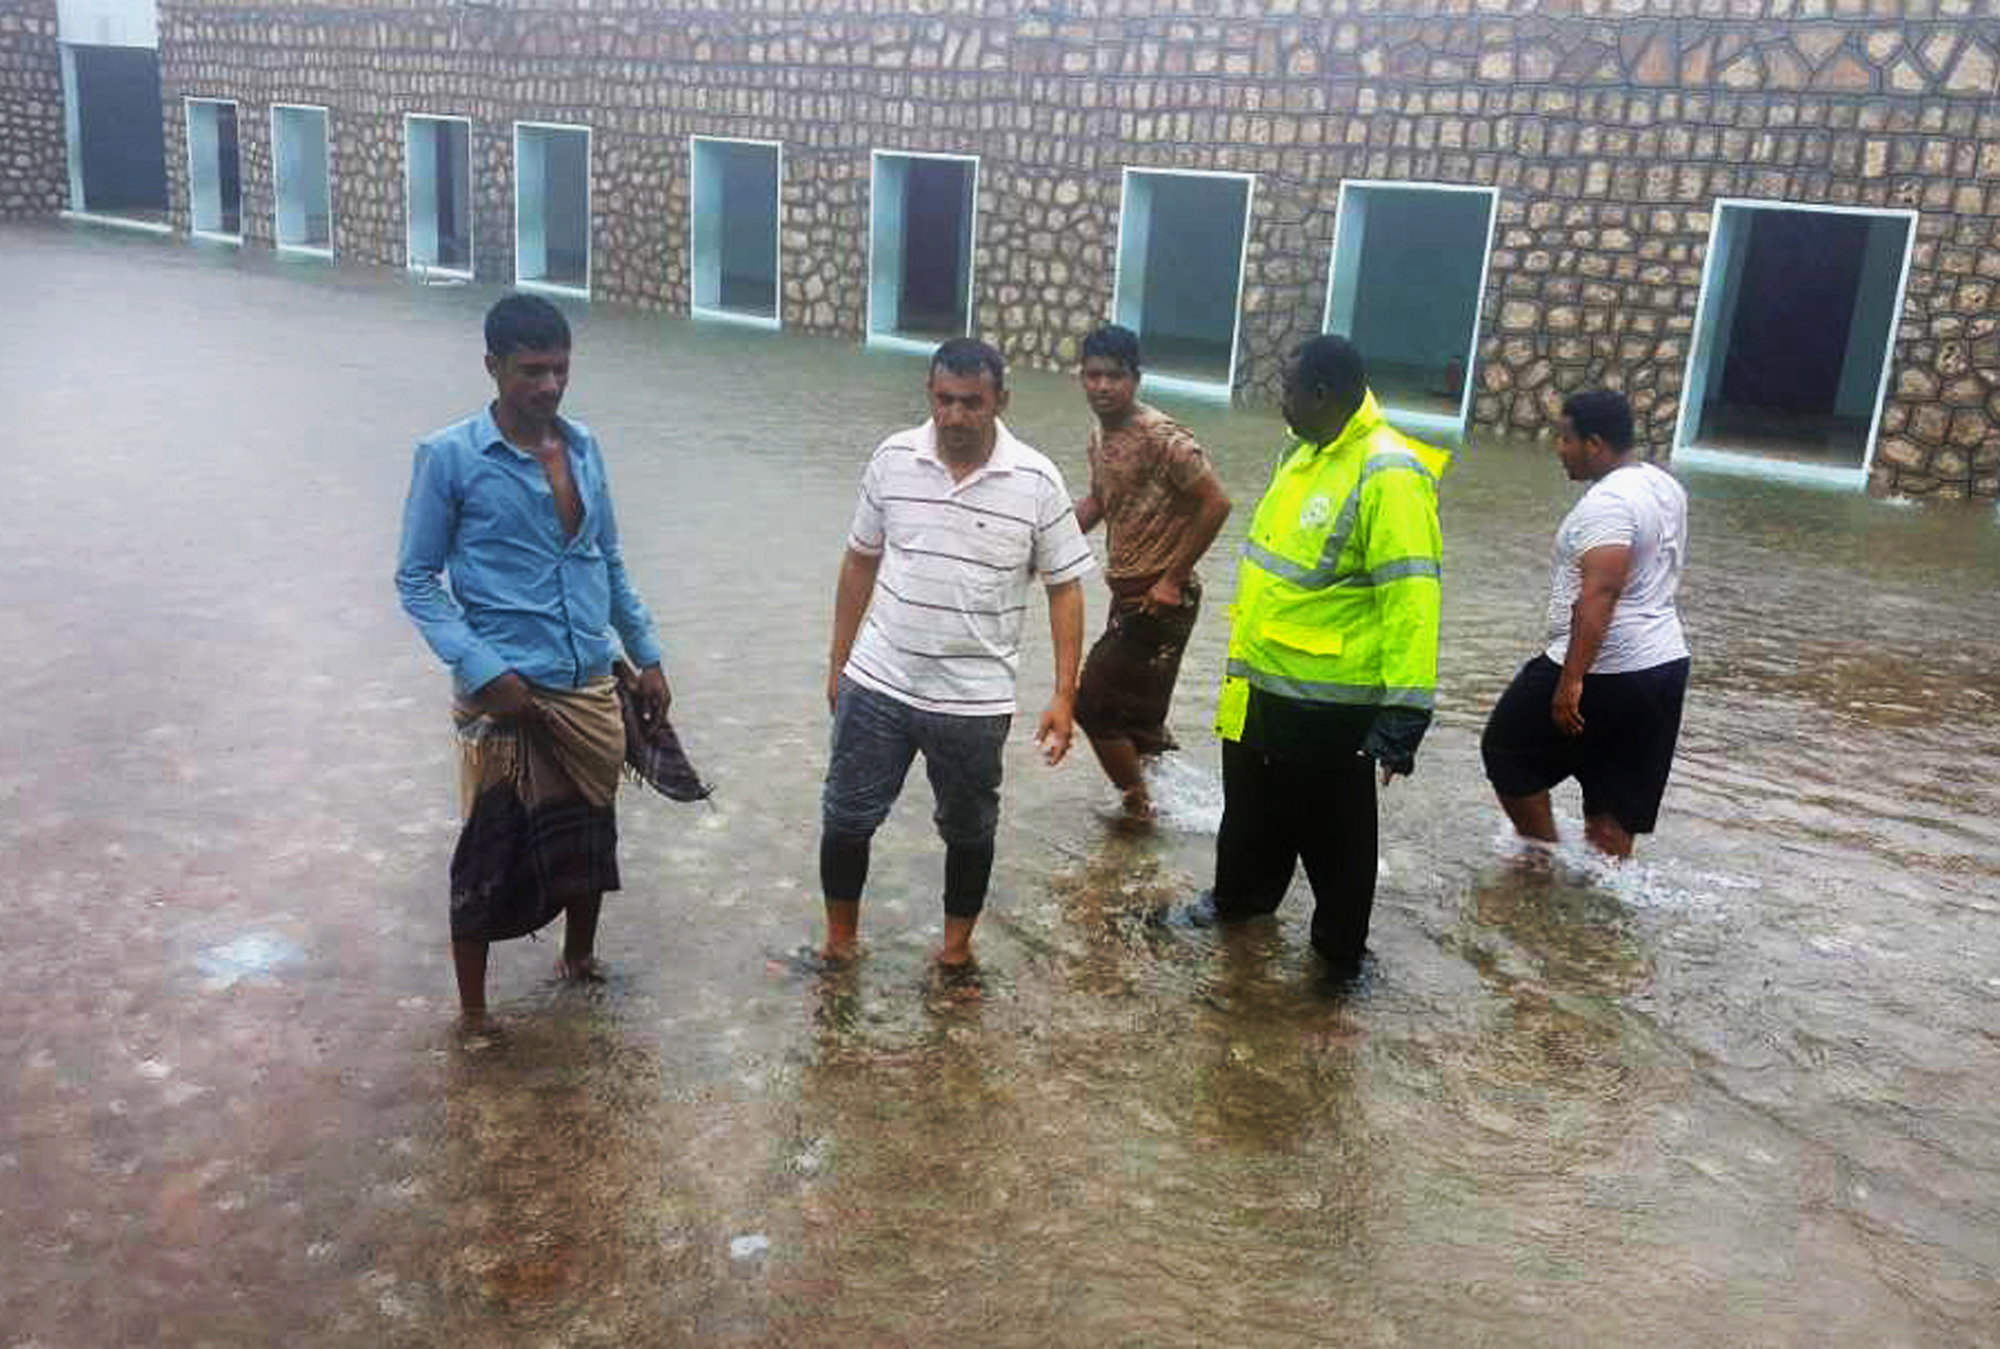 Oman_Cyclone_20838-159532.jpg92387362